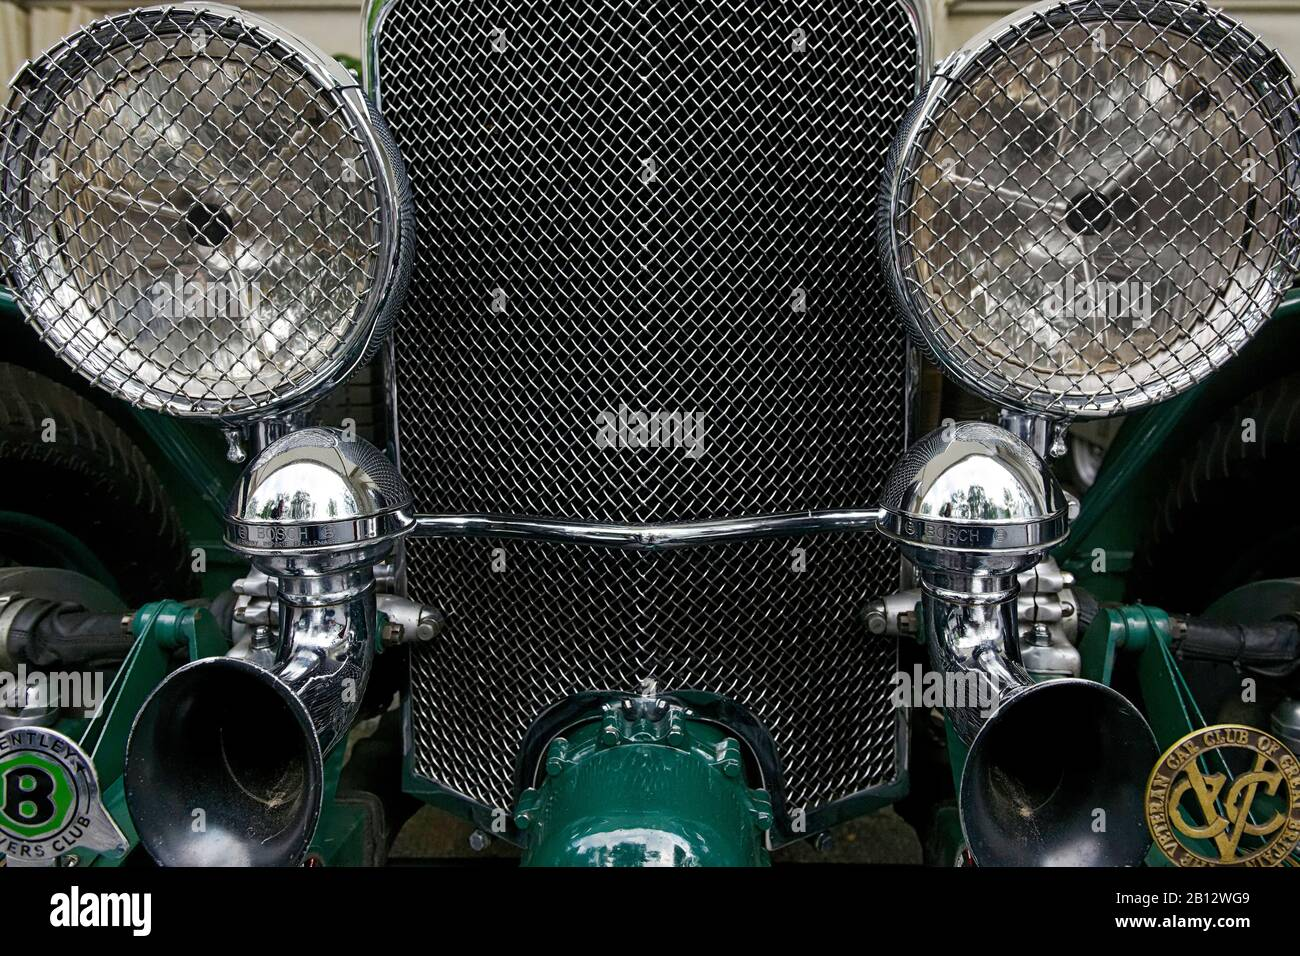 Bentley,distinctive headlights,grille,classic car,historic vehicle,Hamburg,Germany,Europe Stock Photo